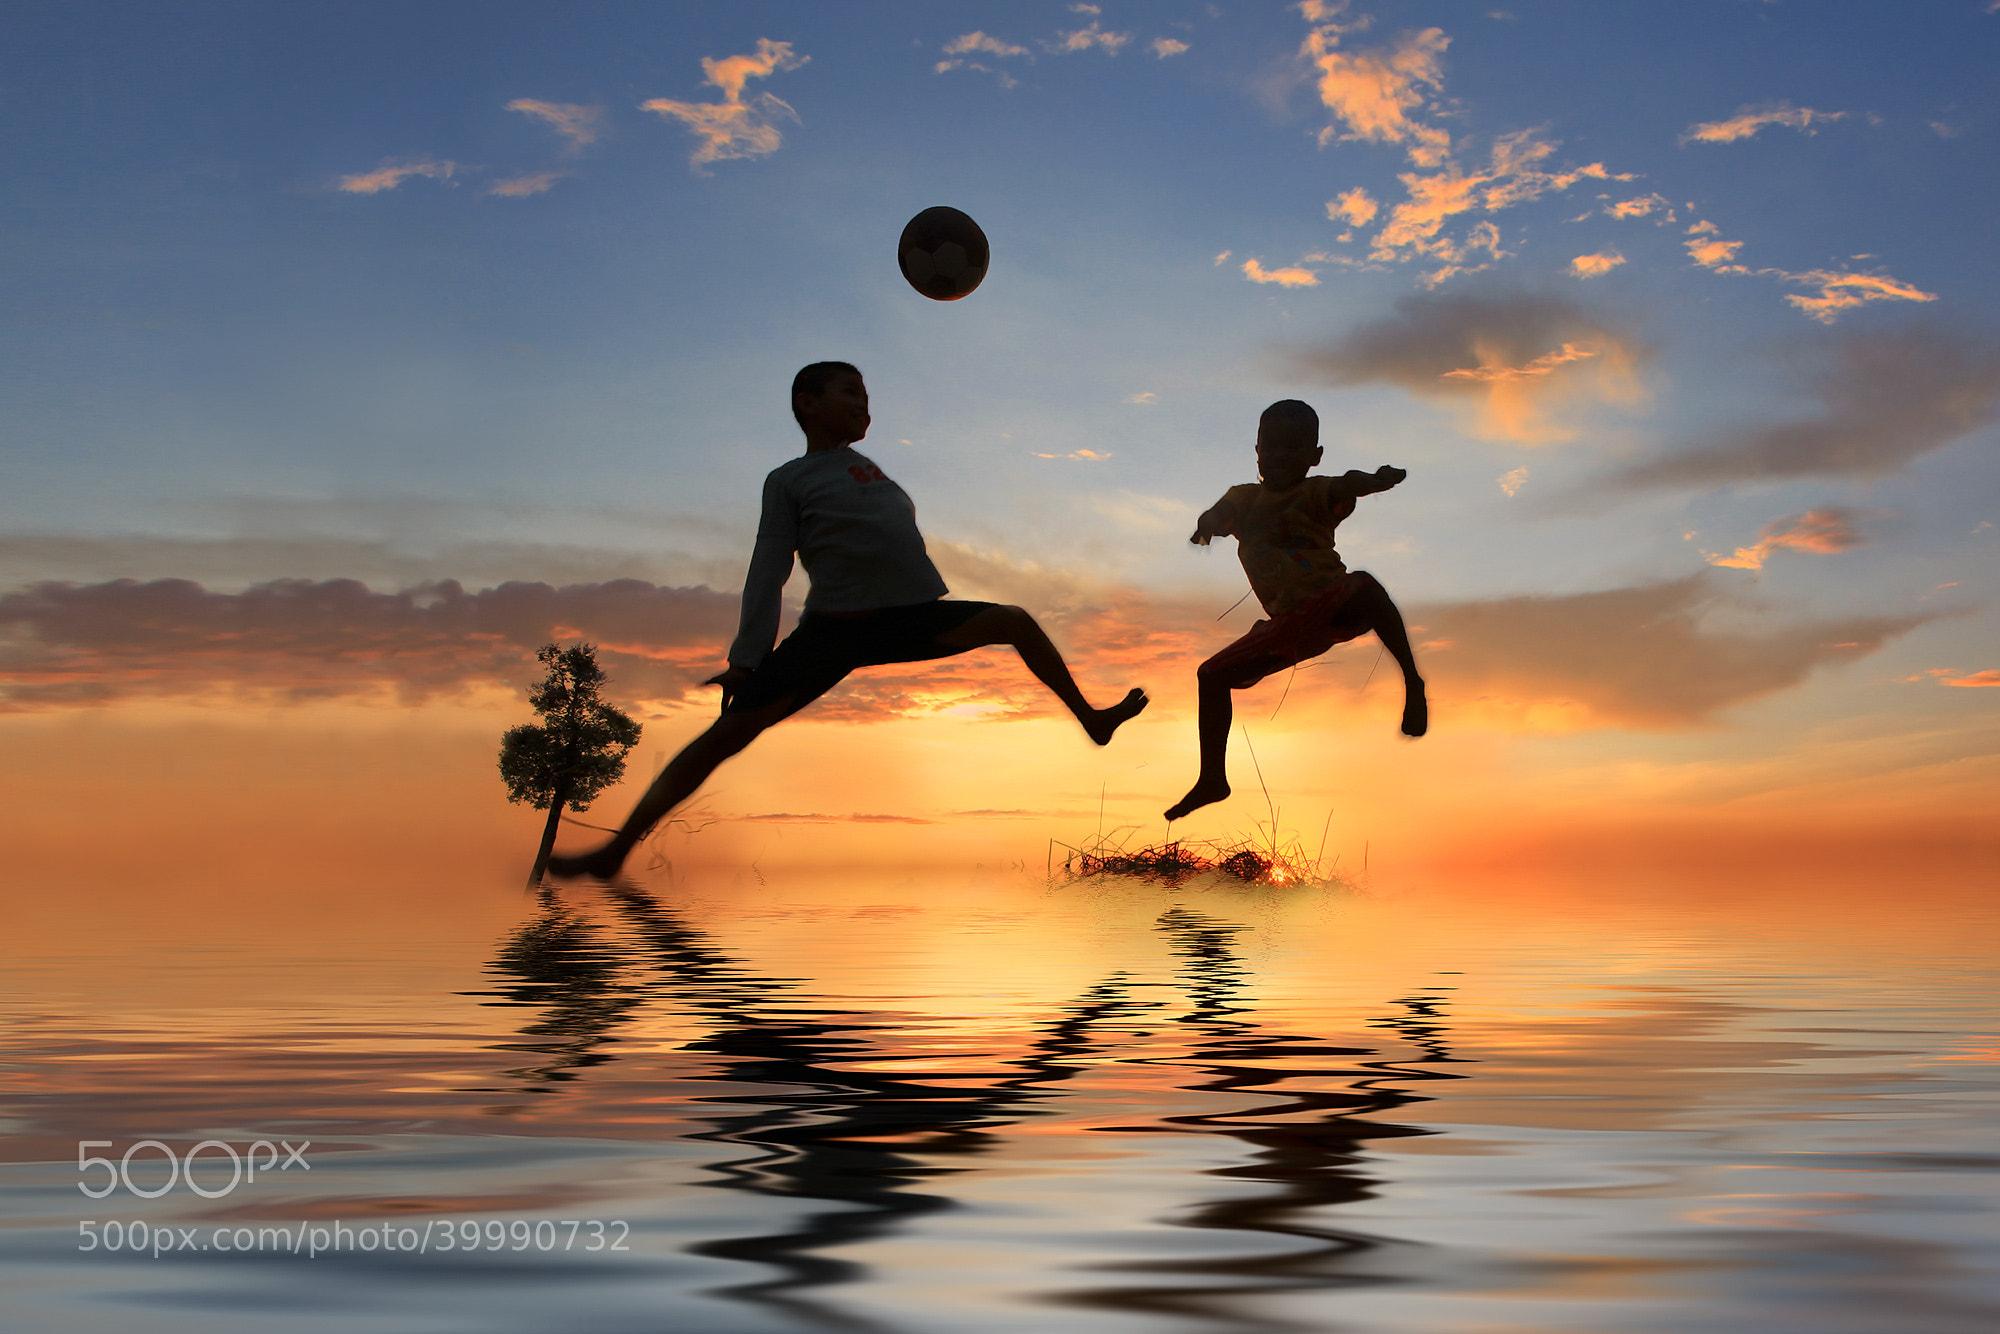 Photograph Fun Fun Fun by Saravut Whanset on 500px